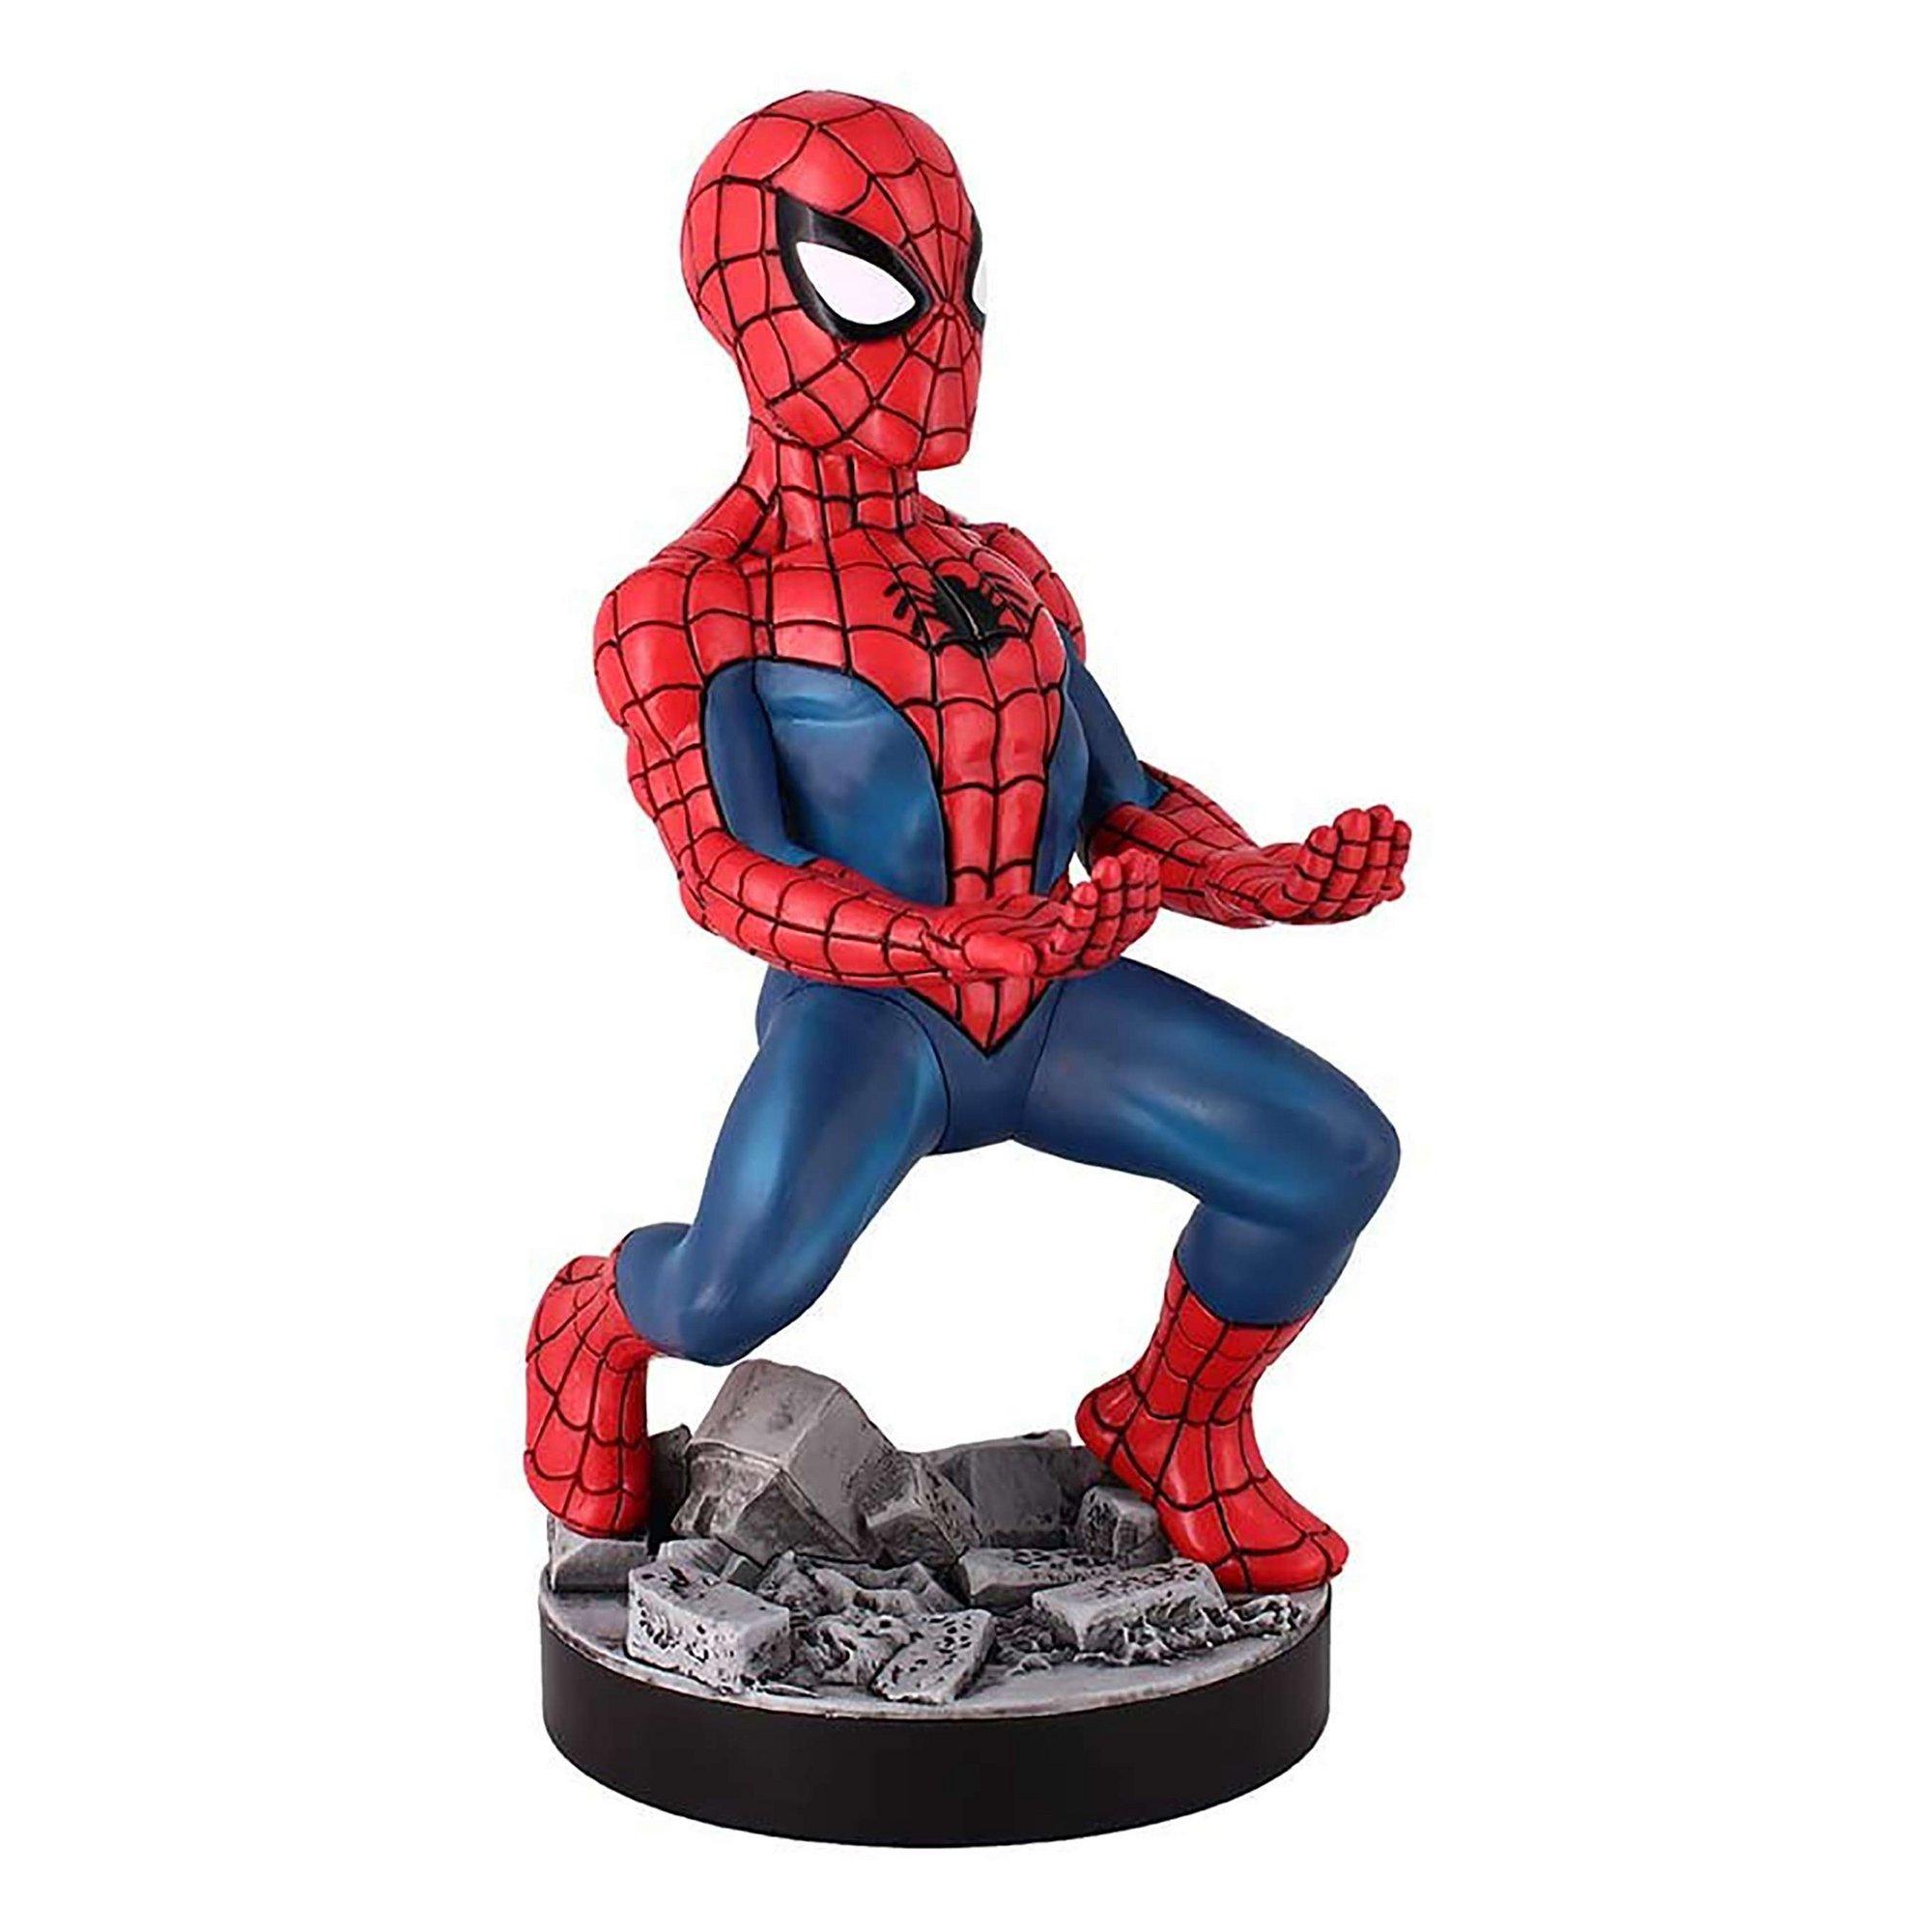 Image of CG Marvel Spider Man Holder